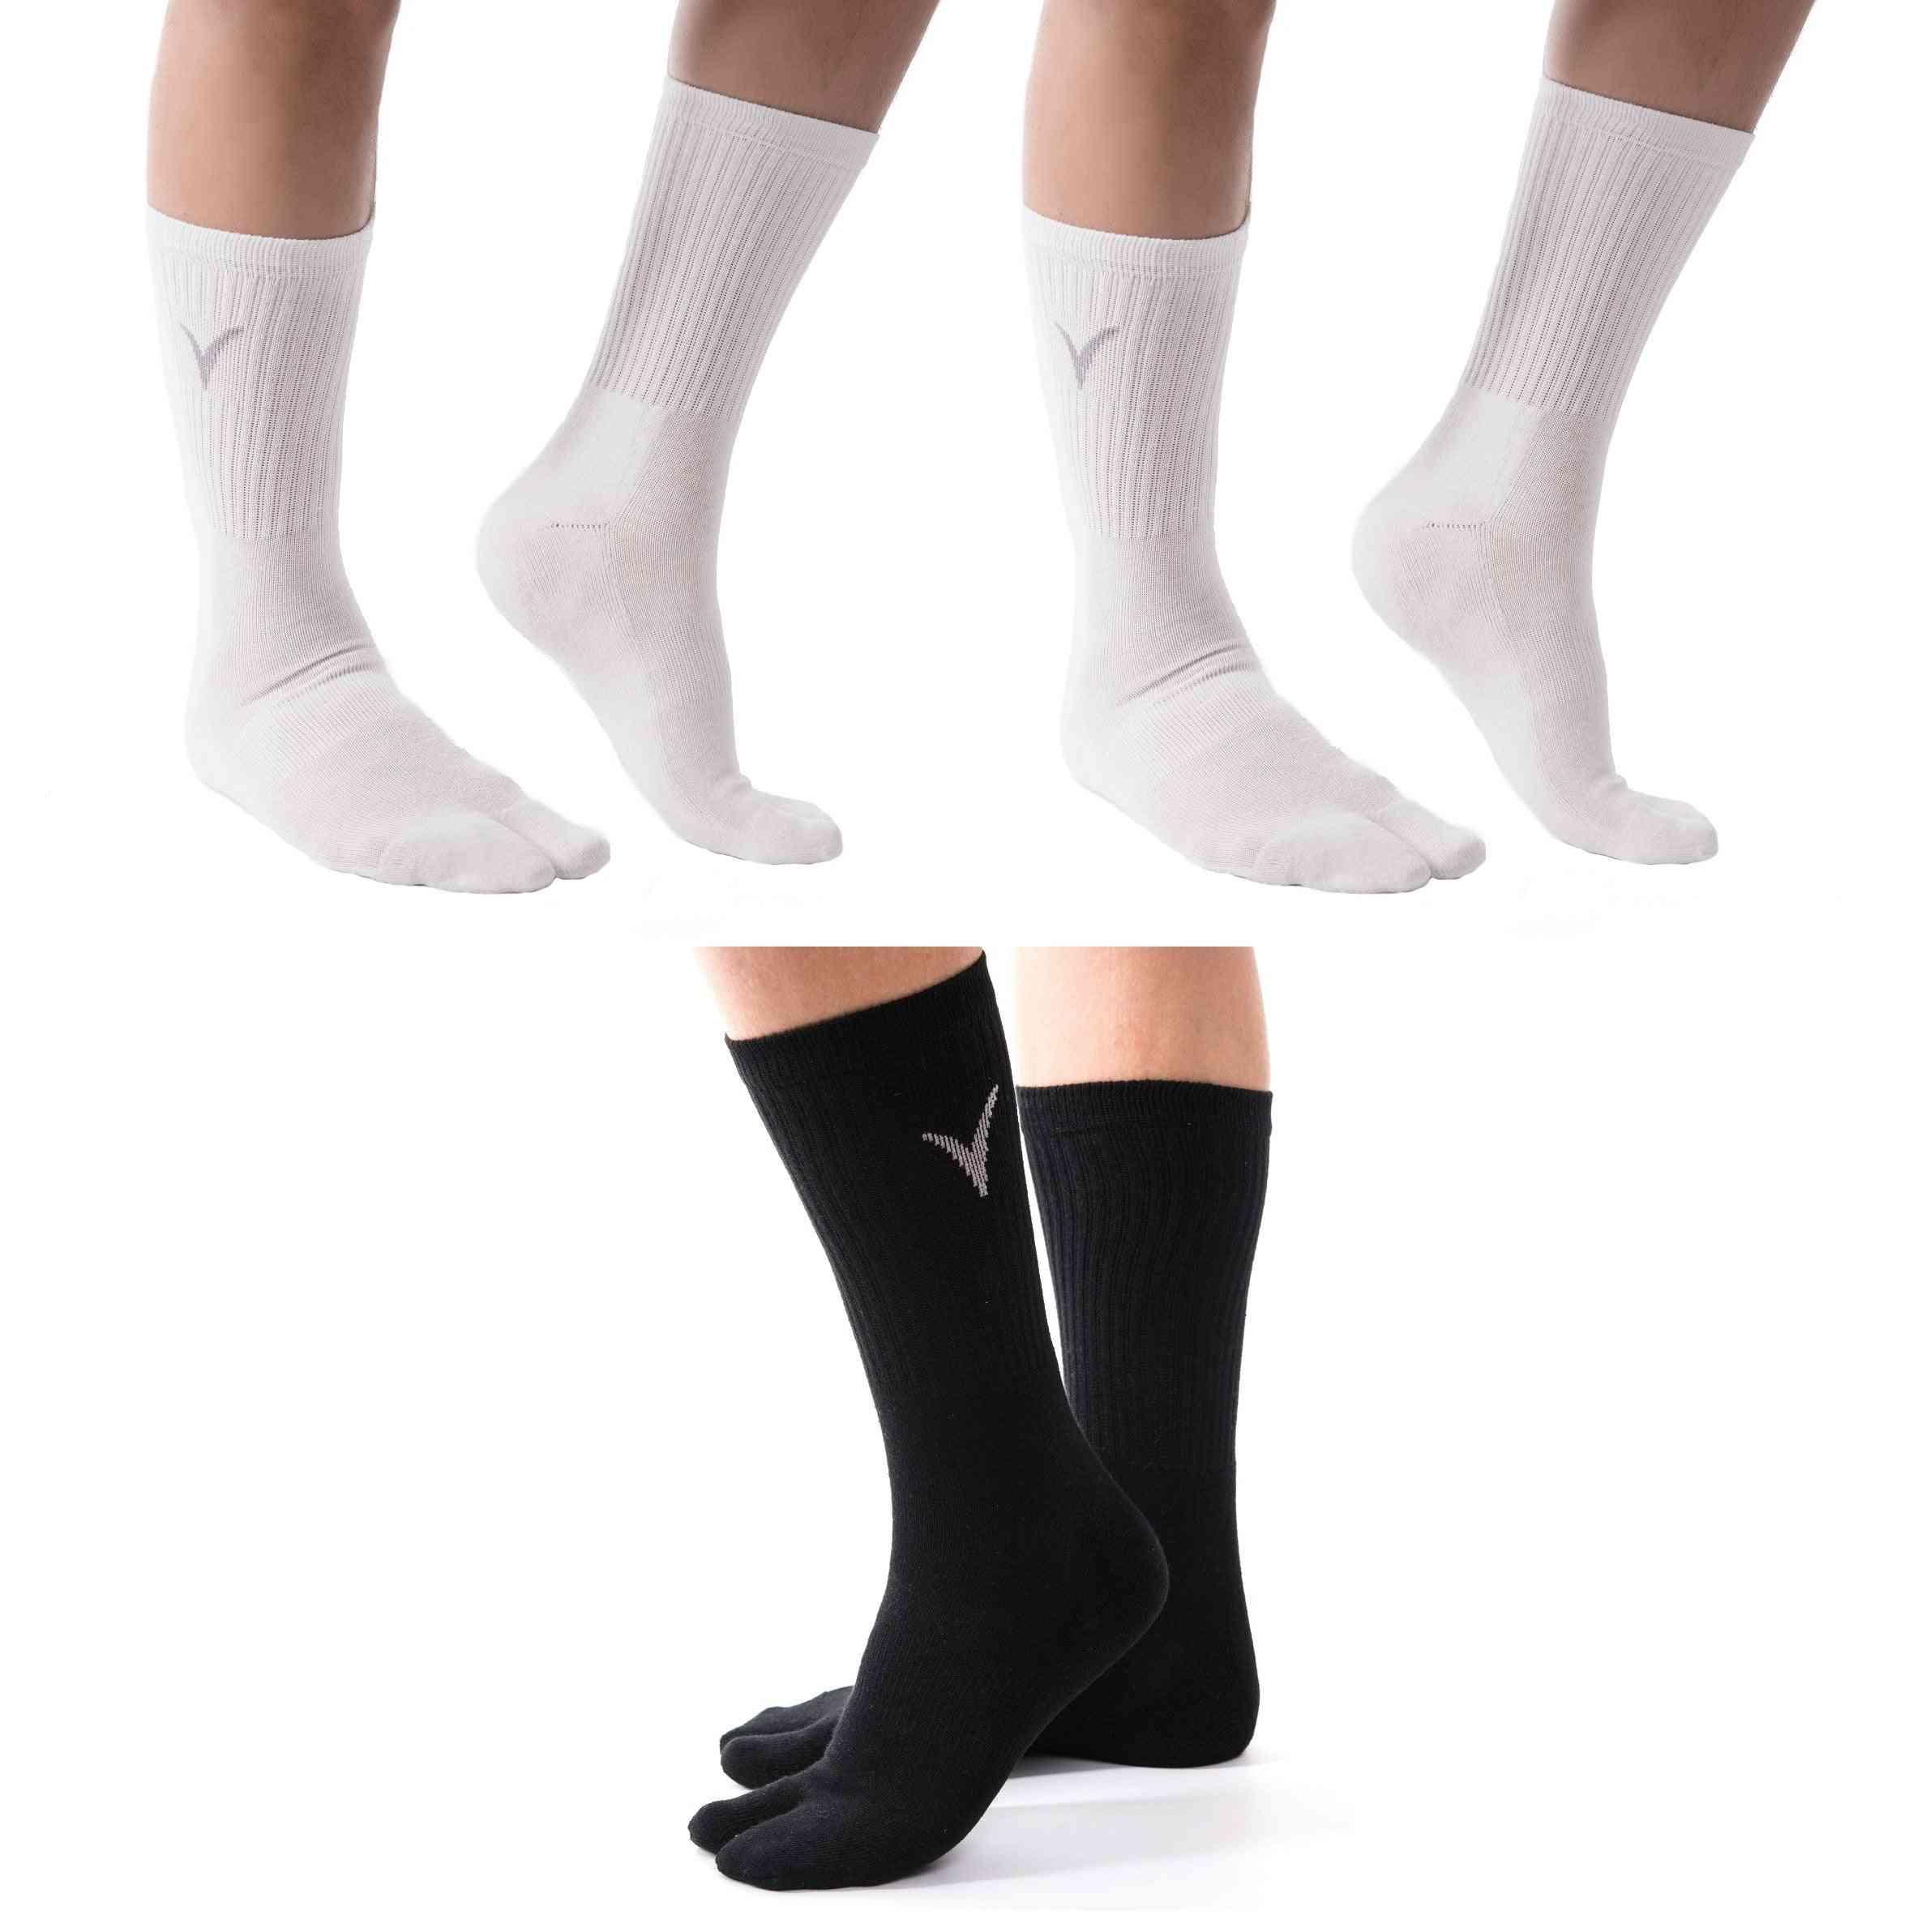 Comfortable Stylish Flip-flop Socks And Women